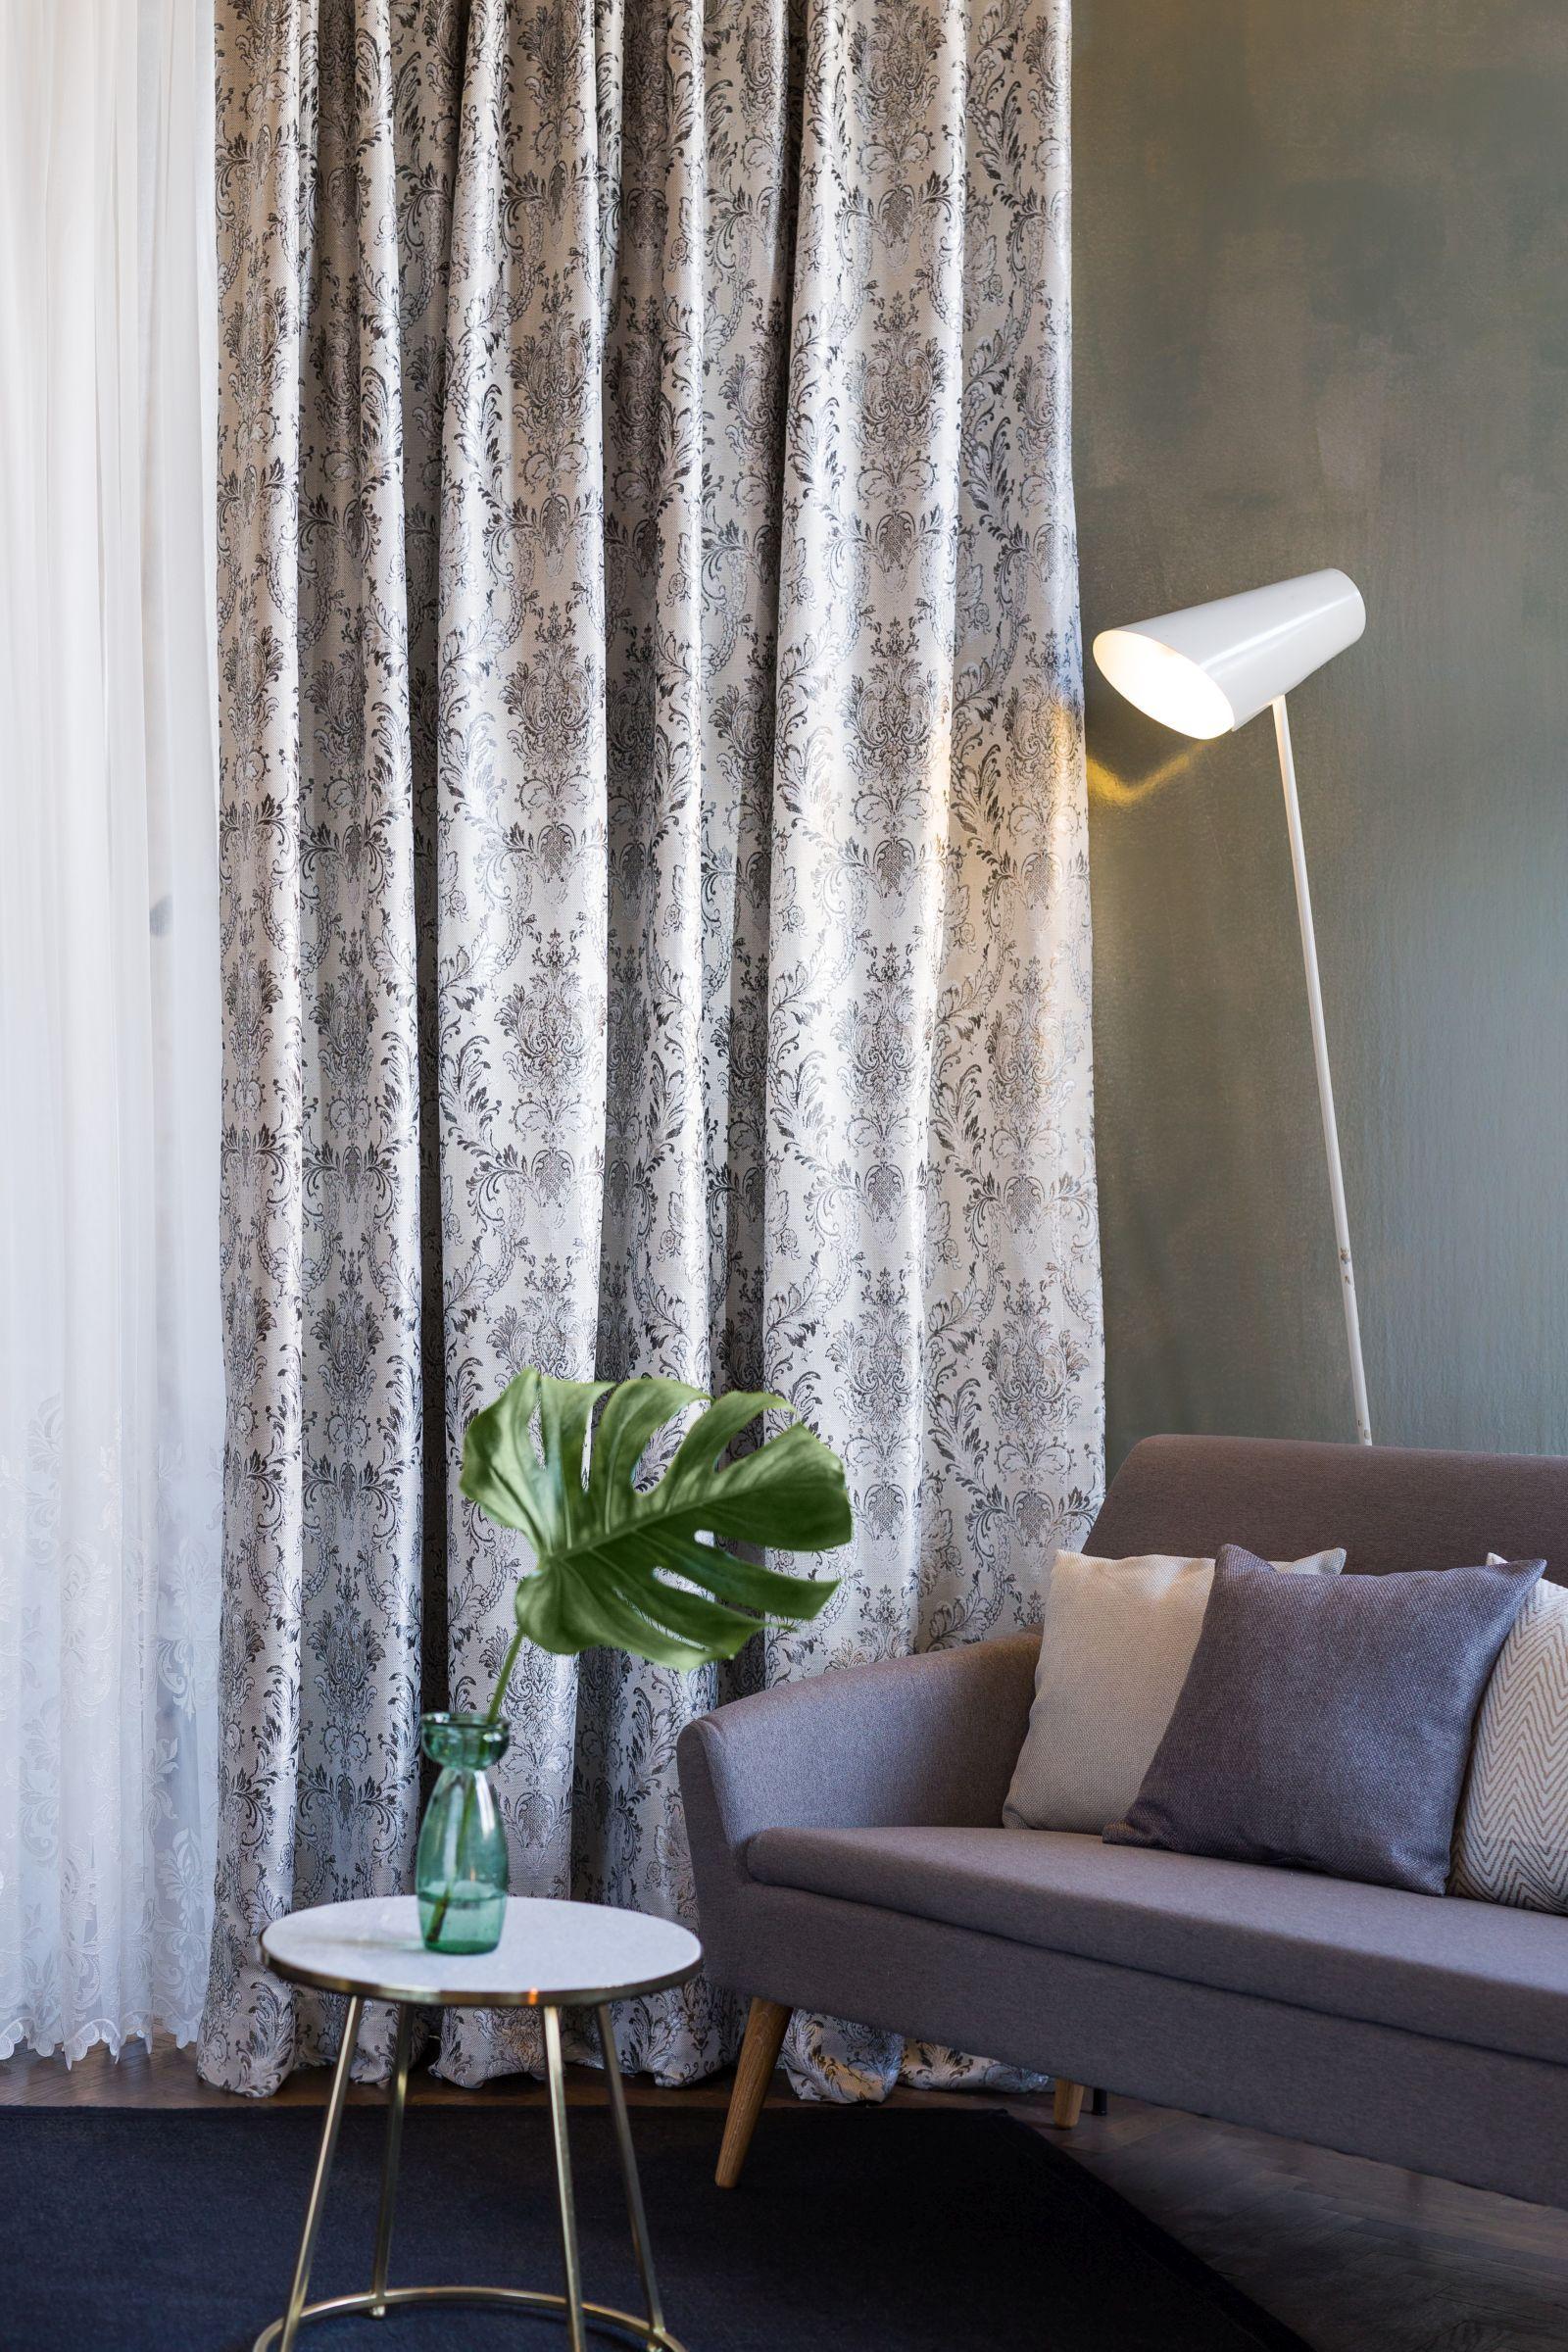 #mendolafabrics #curtains #draperii #sheercurtains #sheers #perdele #classicdecor #design #homedecor #livingroom #interiordesign #decor